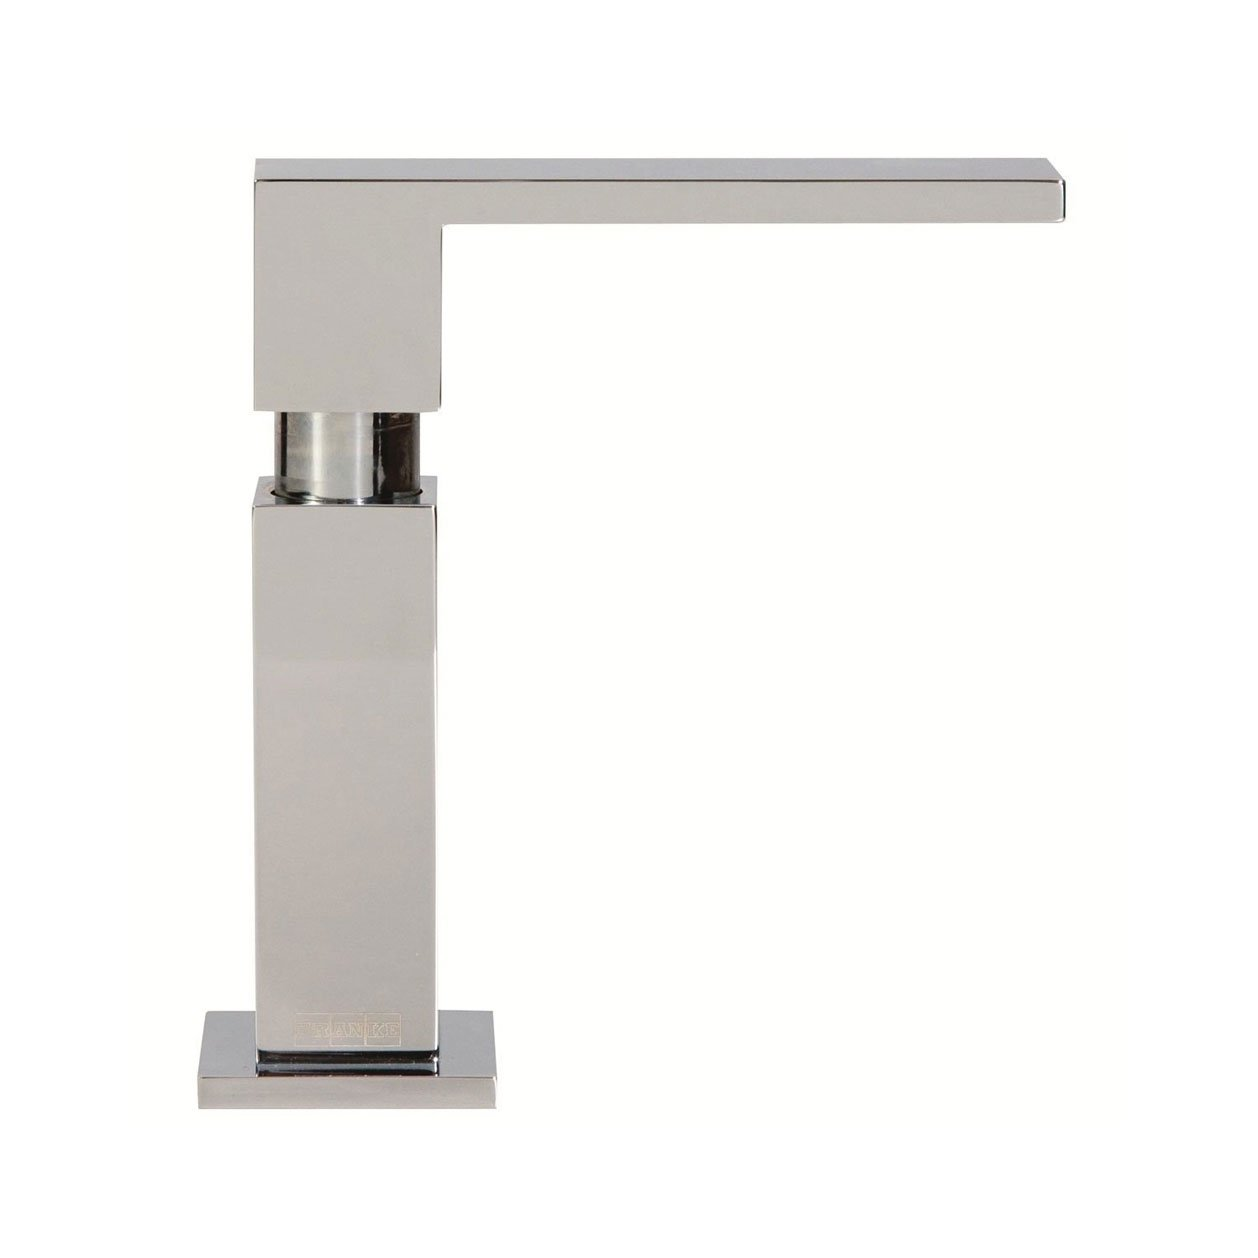 Franke SD-880 Mythos In-Sink Soap or Lotion Dispenser, Satin Nickel